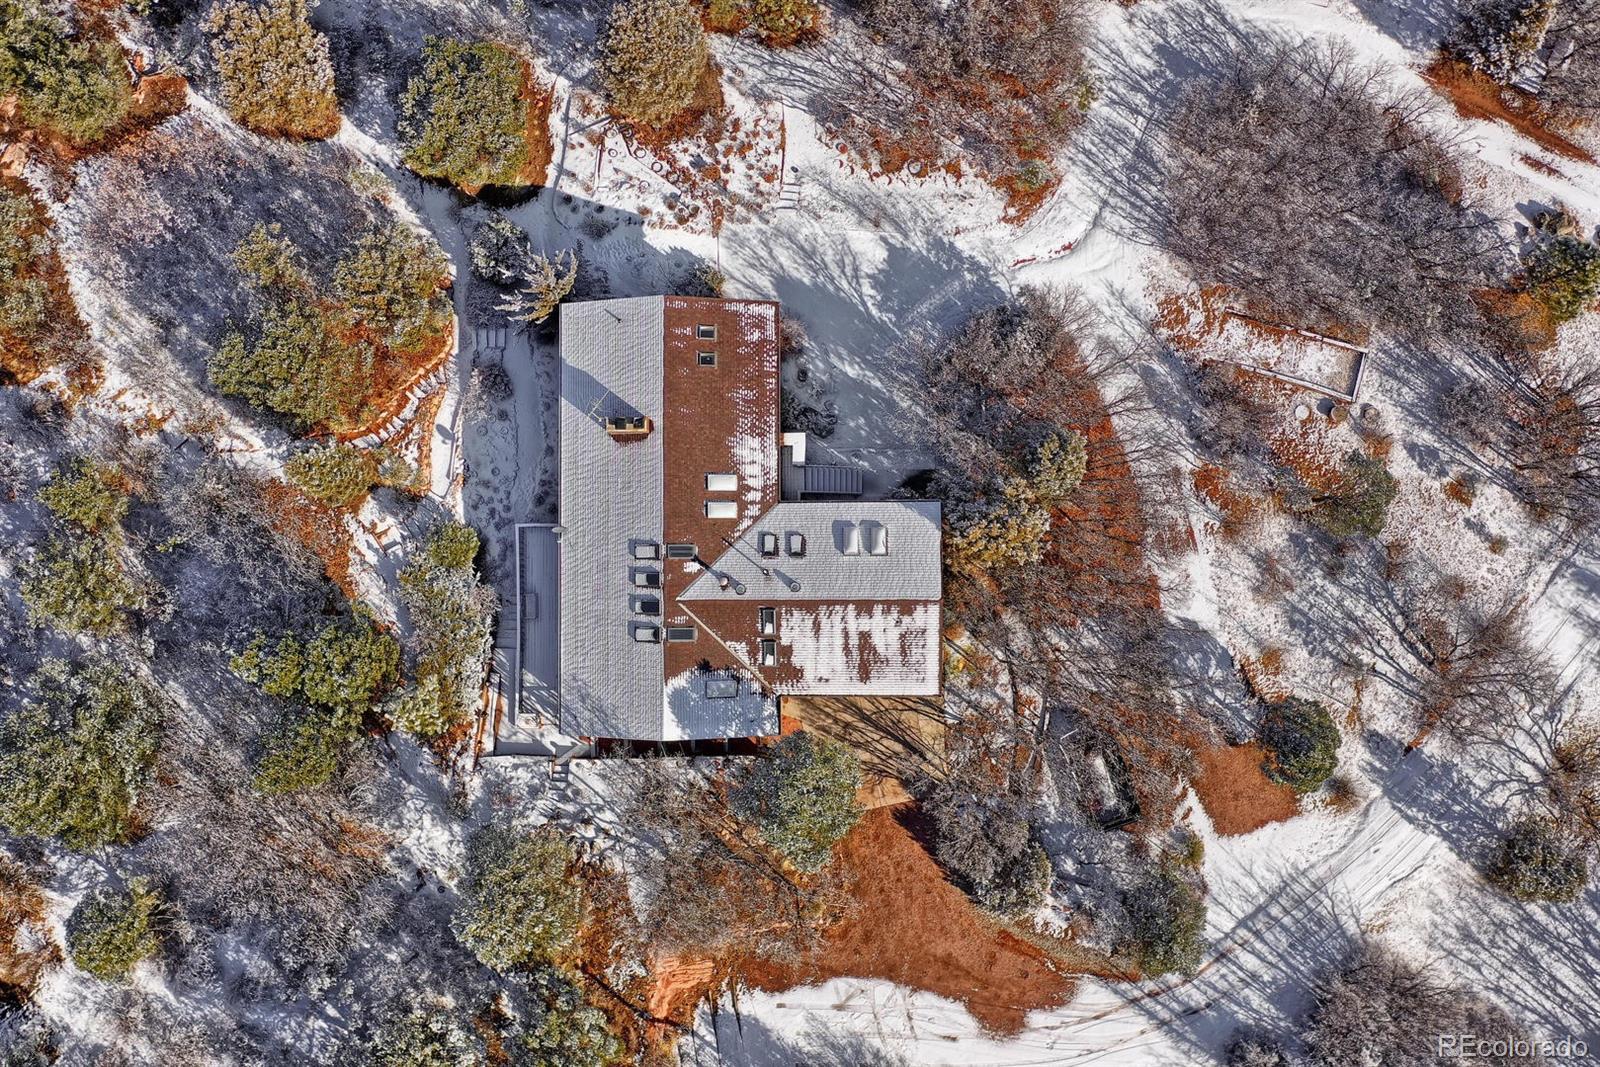 MLS# 2704020 - 4 - 11440 Valle Verde Drive, Colorado Springs, CO 80926